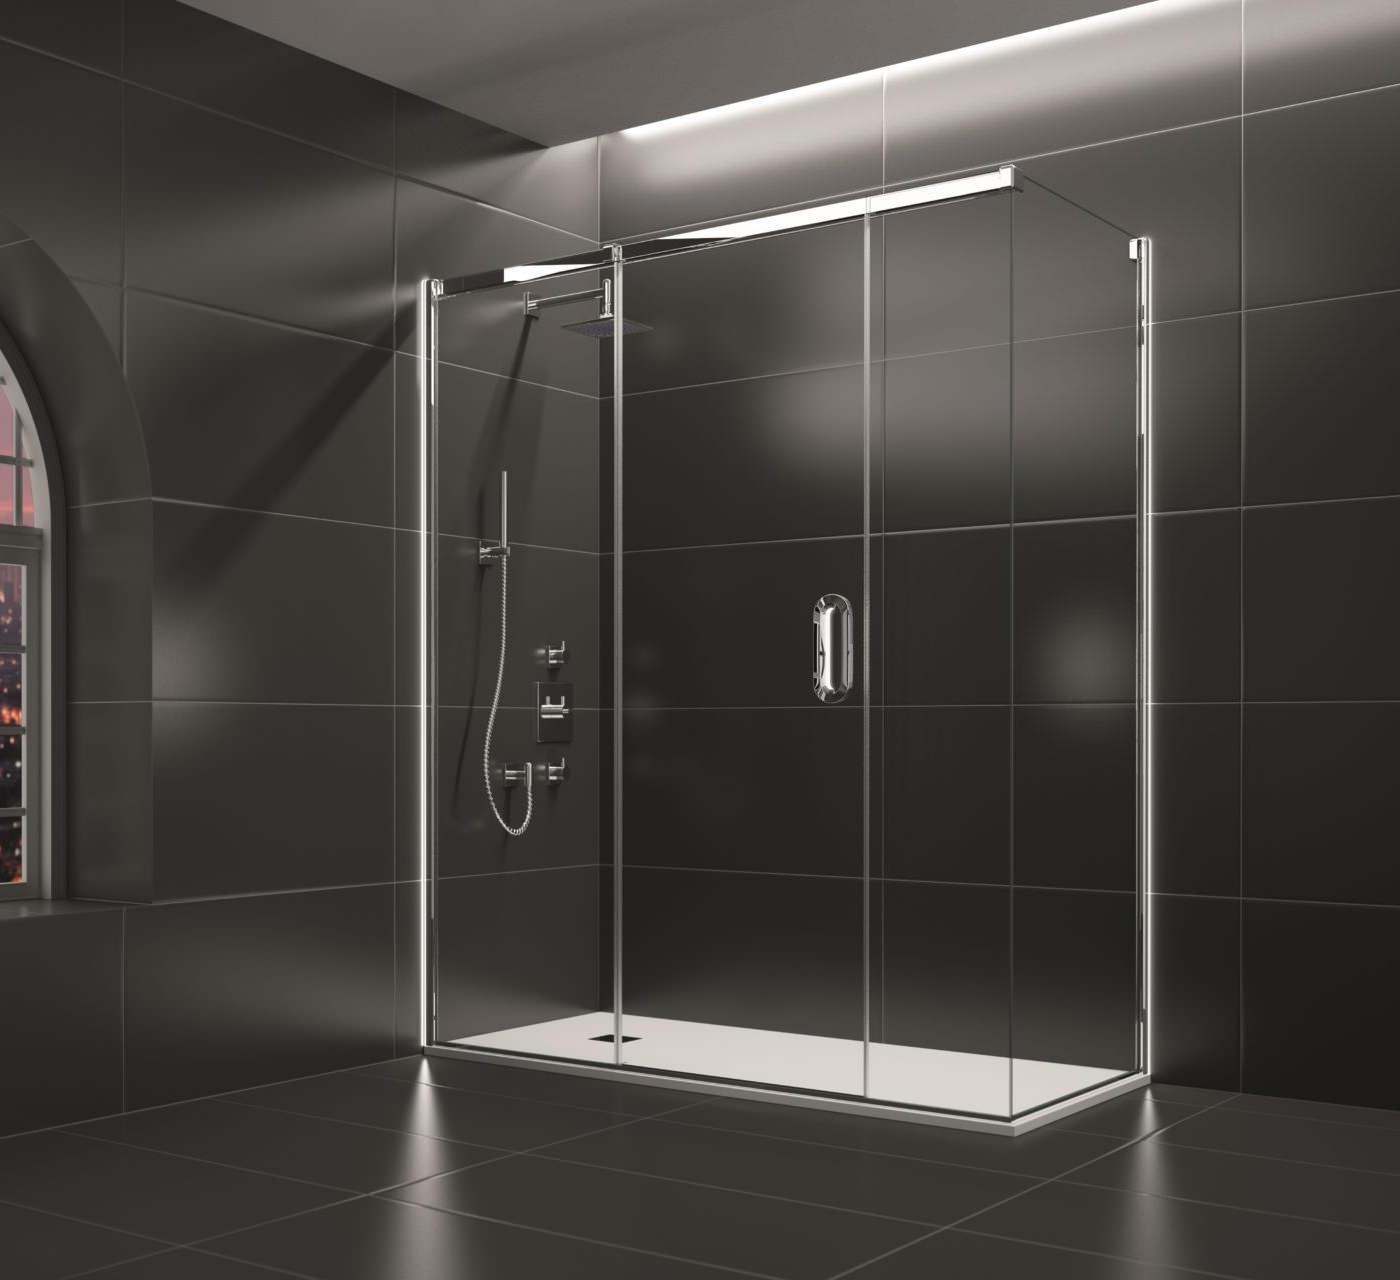 3 Panel Sliding Glass Door: Merlyn Arysto 3 Panel Sliding Door 1600mm